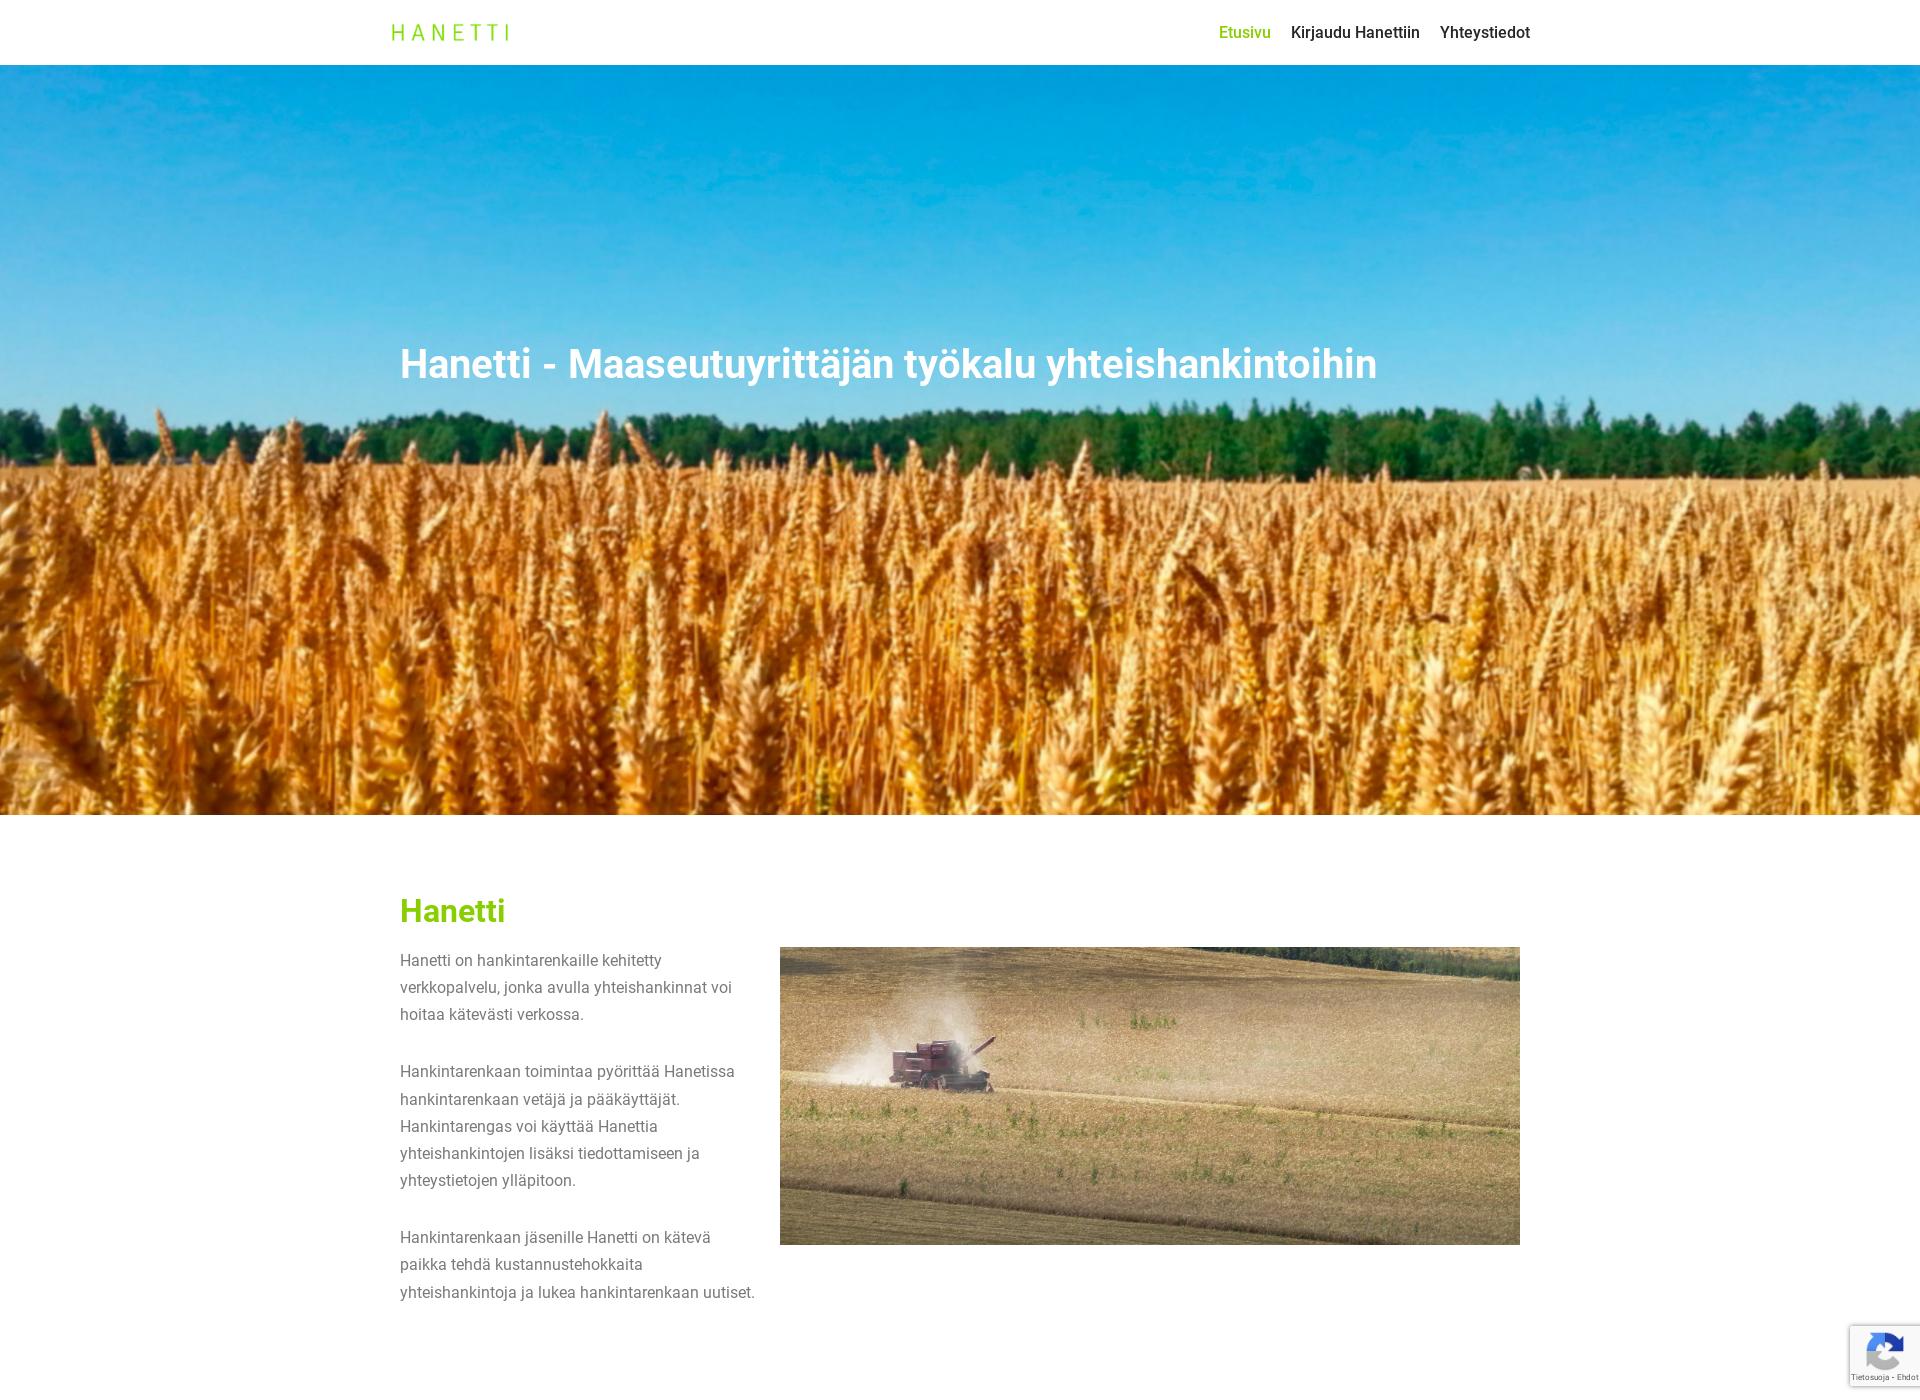 Screenshot for hanetti.fi